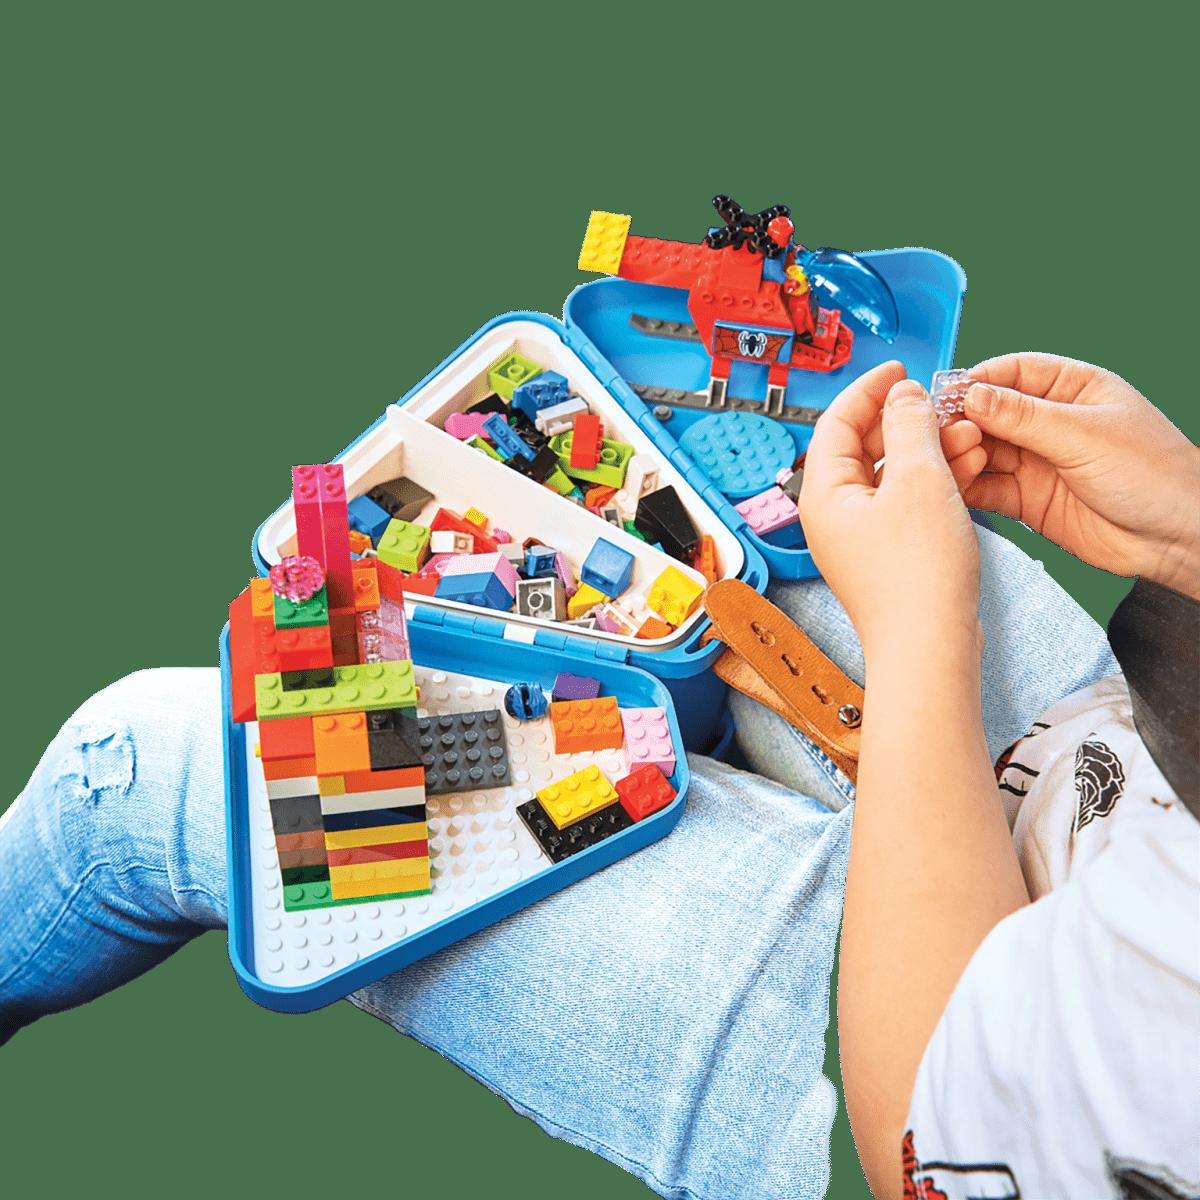 INNOVATIVE TOY BOX FOR KIDS: TEEBEE